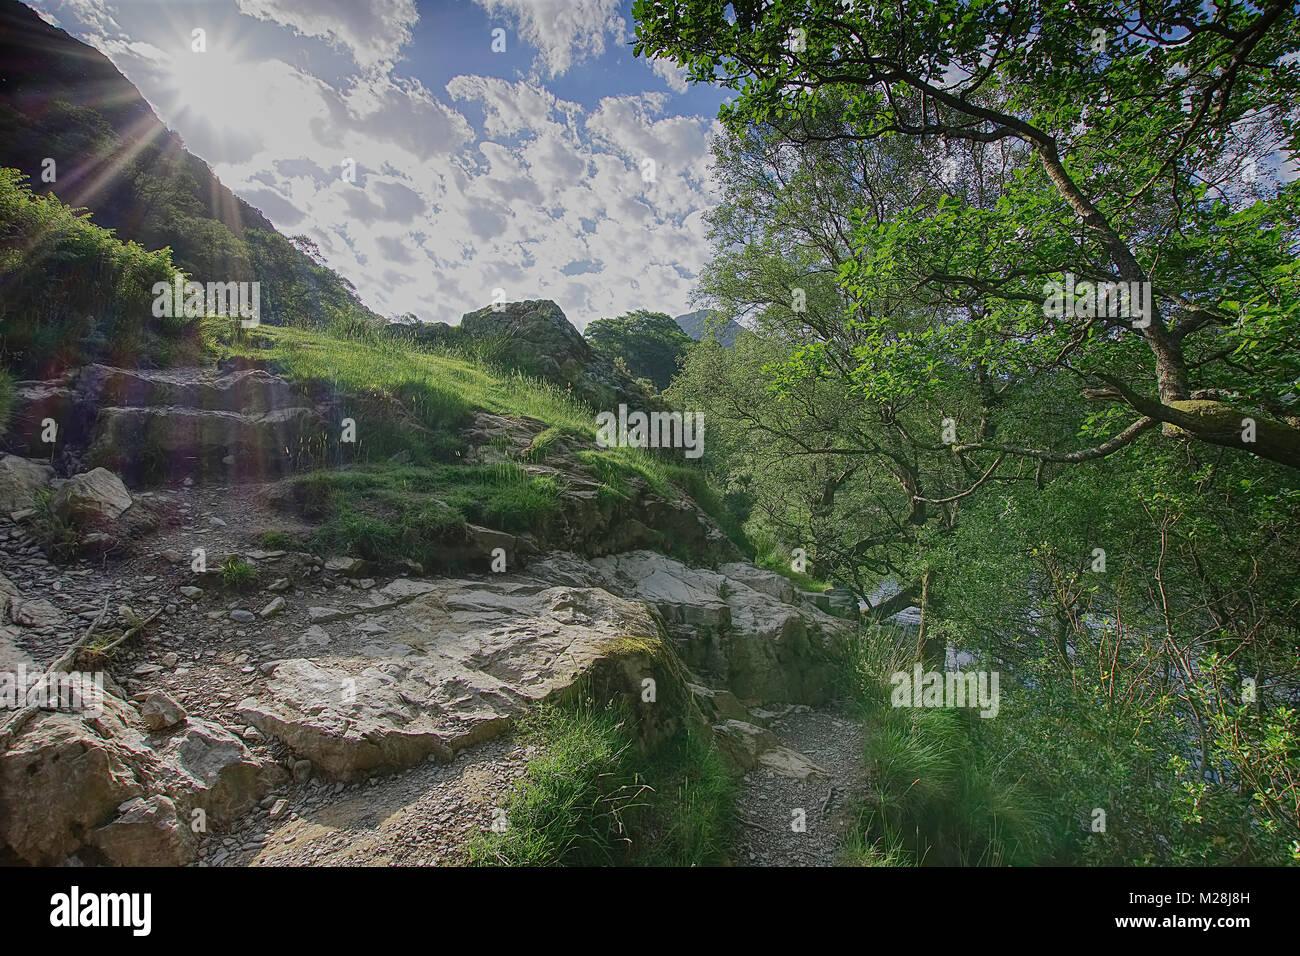 Ruta alrededor del lago Buttermere en Lake District National Park, Cumbria, Reino Unido en primavera.uk.paisaje Imagen De Stock